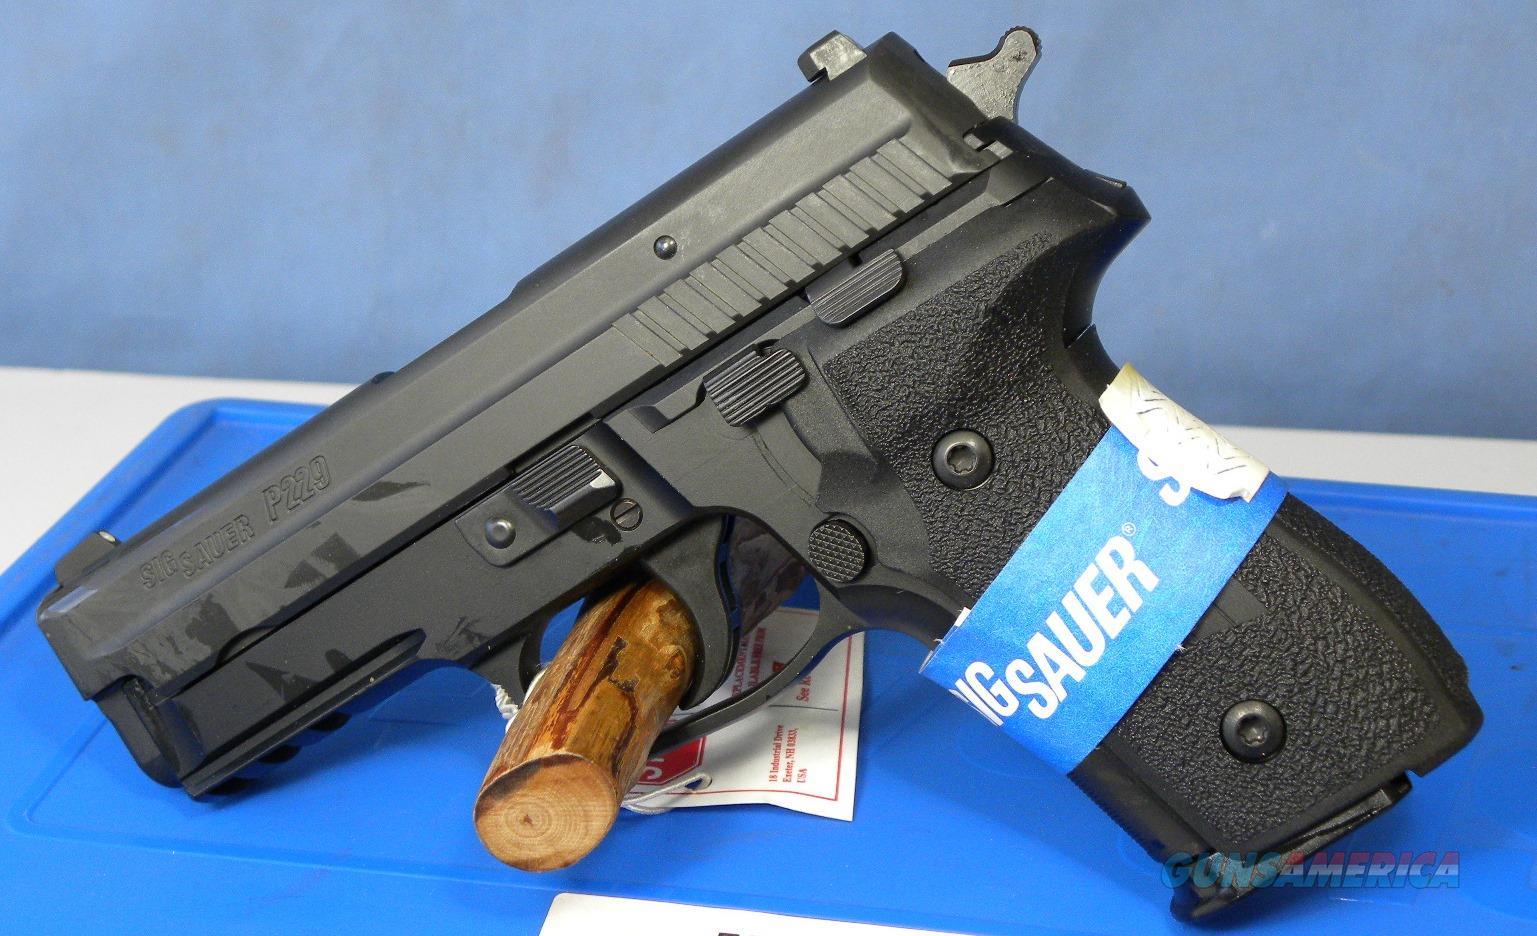 Sig Sauer 229R-40-BSS  Guns > Pistols > Sig - Sauer/Sigarms Pistols > P229